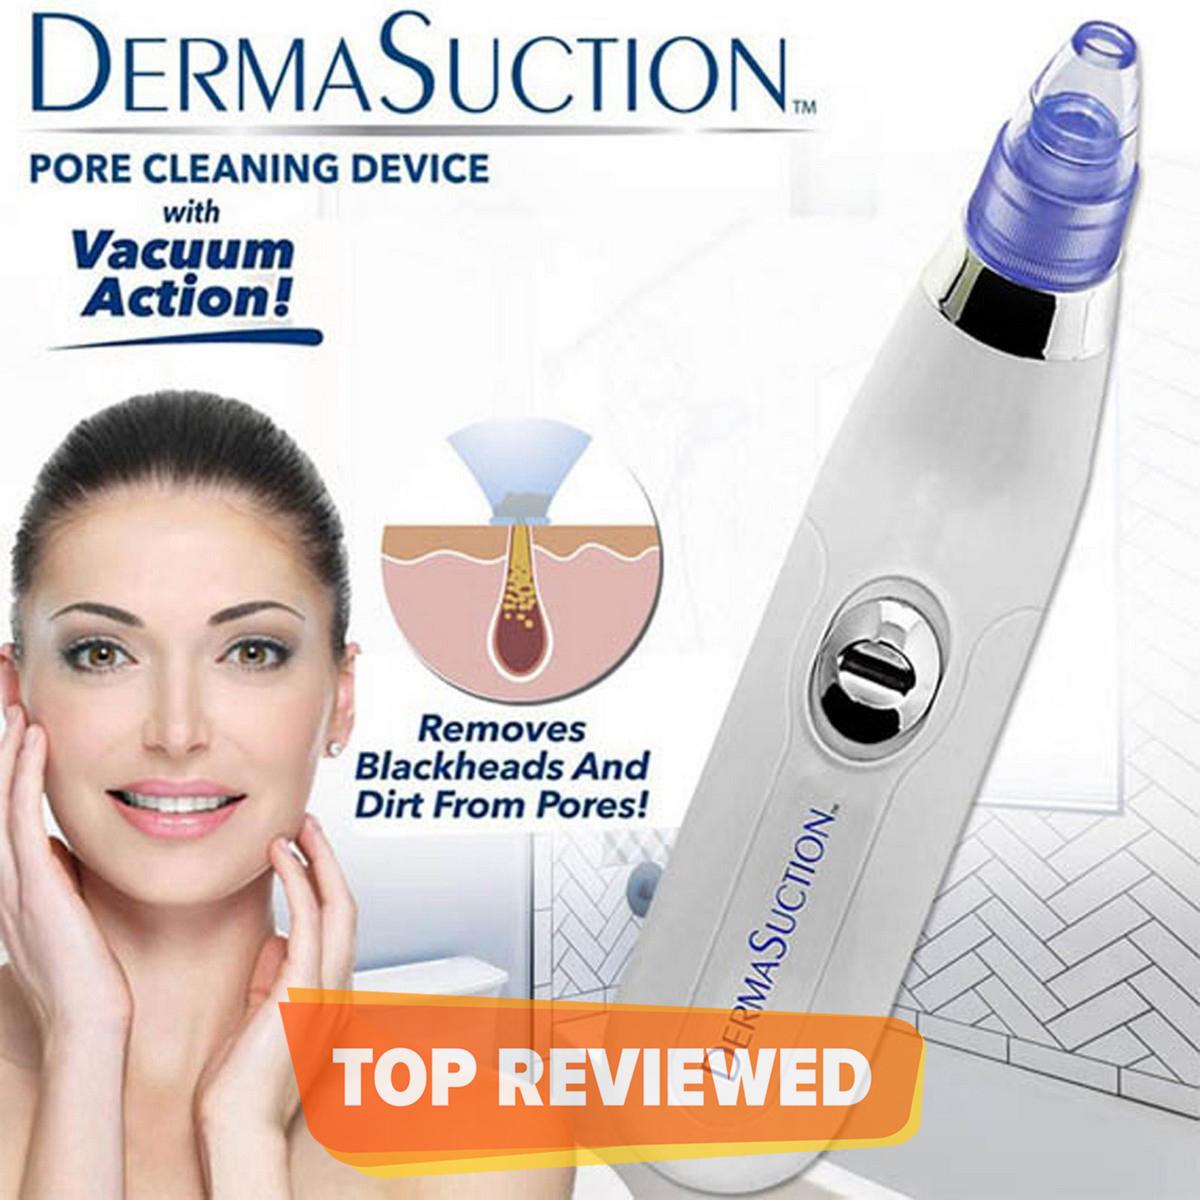 Blackhead Removal Machine Derma Suction 4 in 1 Black Head Remover Machine - Acne Pore Cleaner Vacuum Suction Tool Blackhead Removal On Nose Sucking Machine